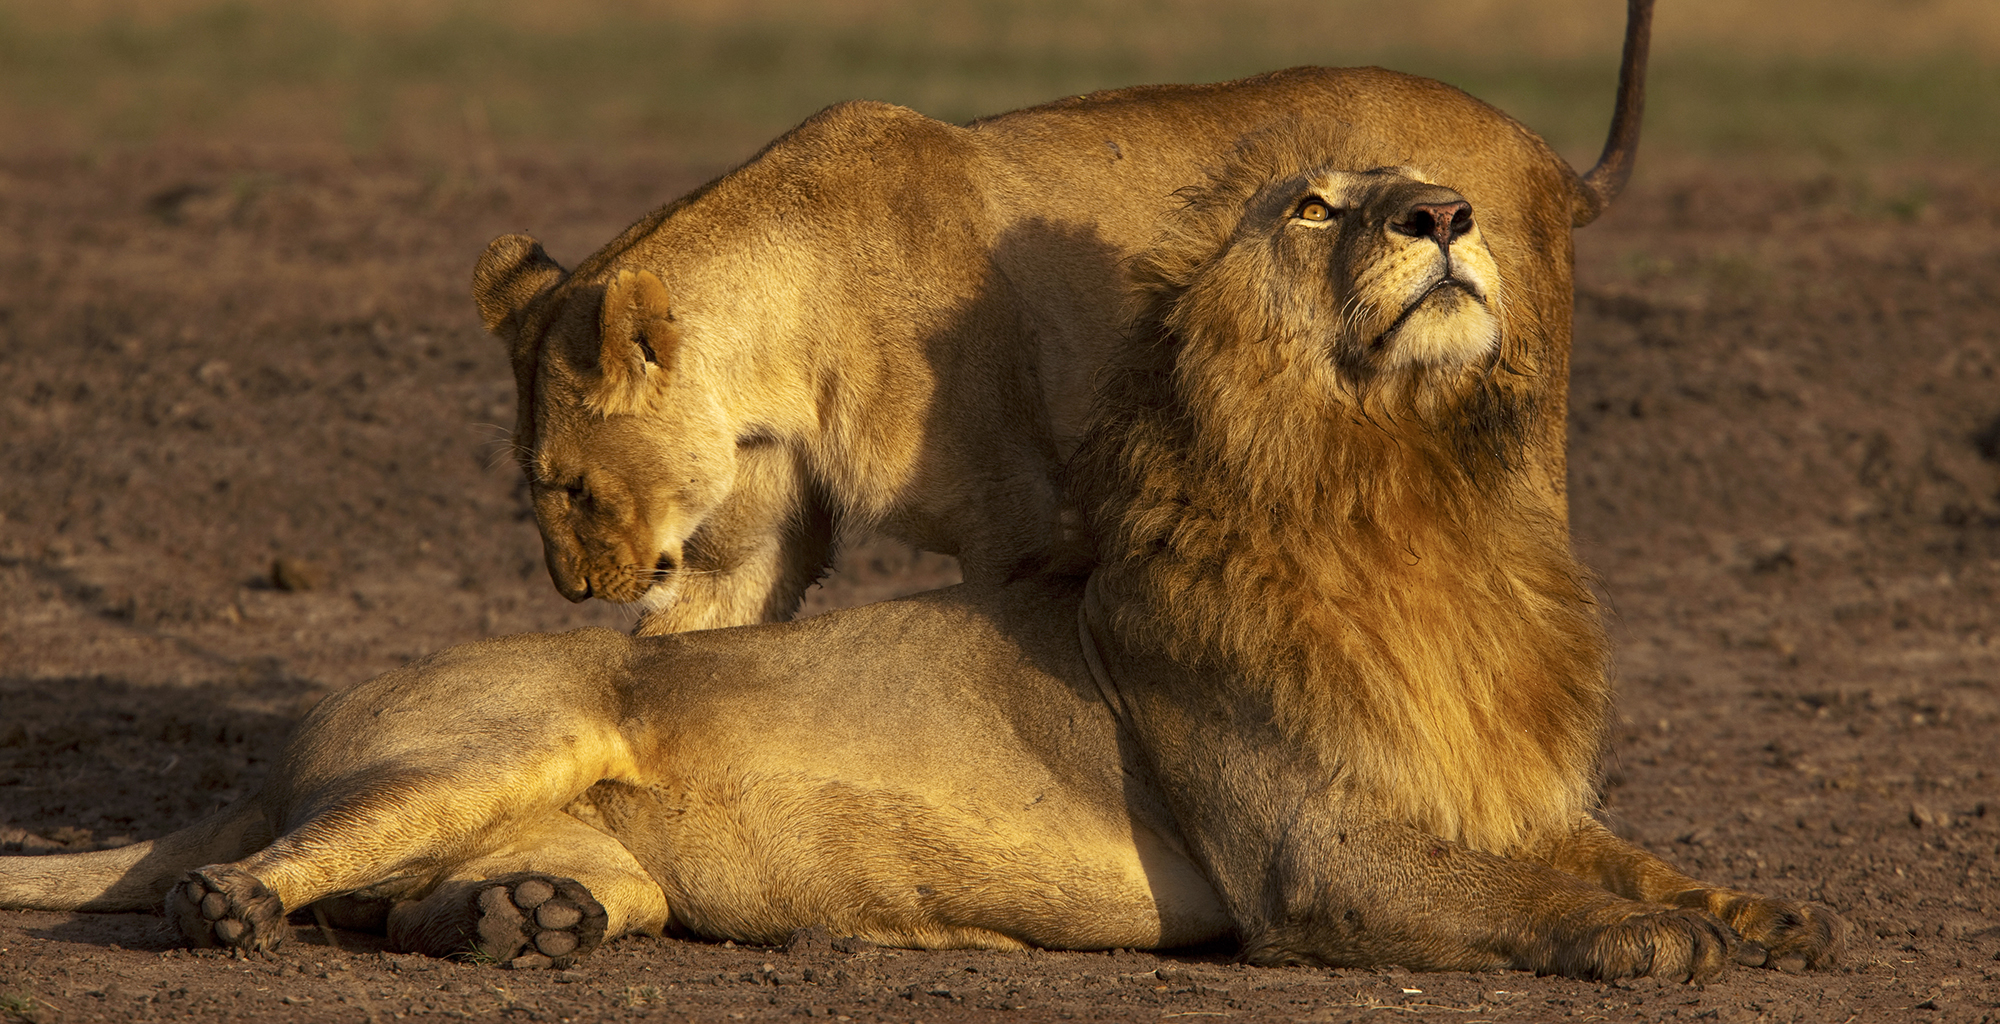 Kenya-Mara-Expedition-Camp-Lion